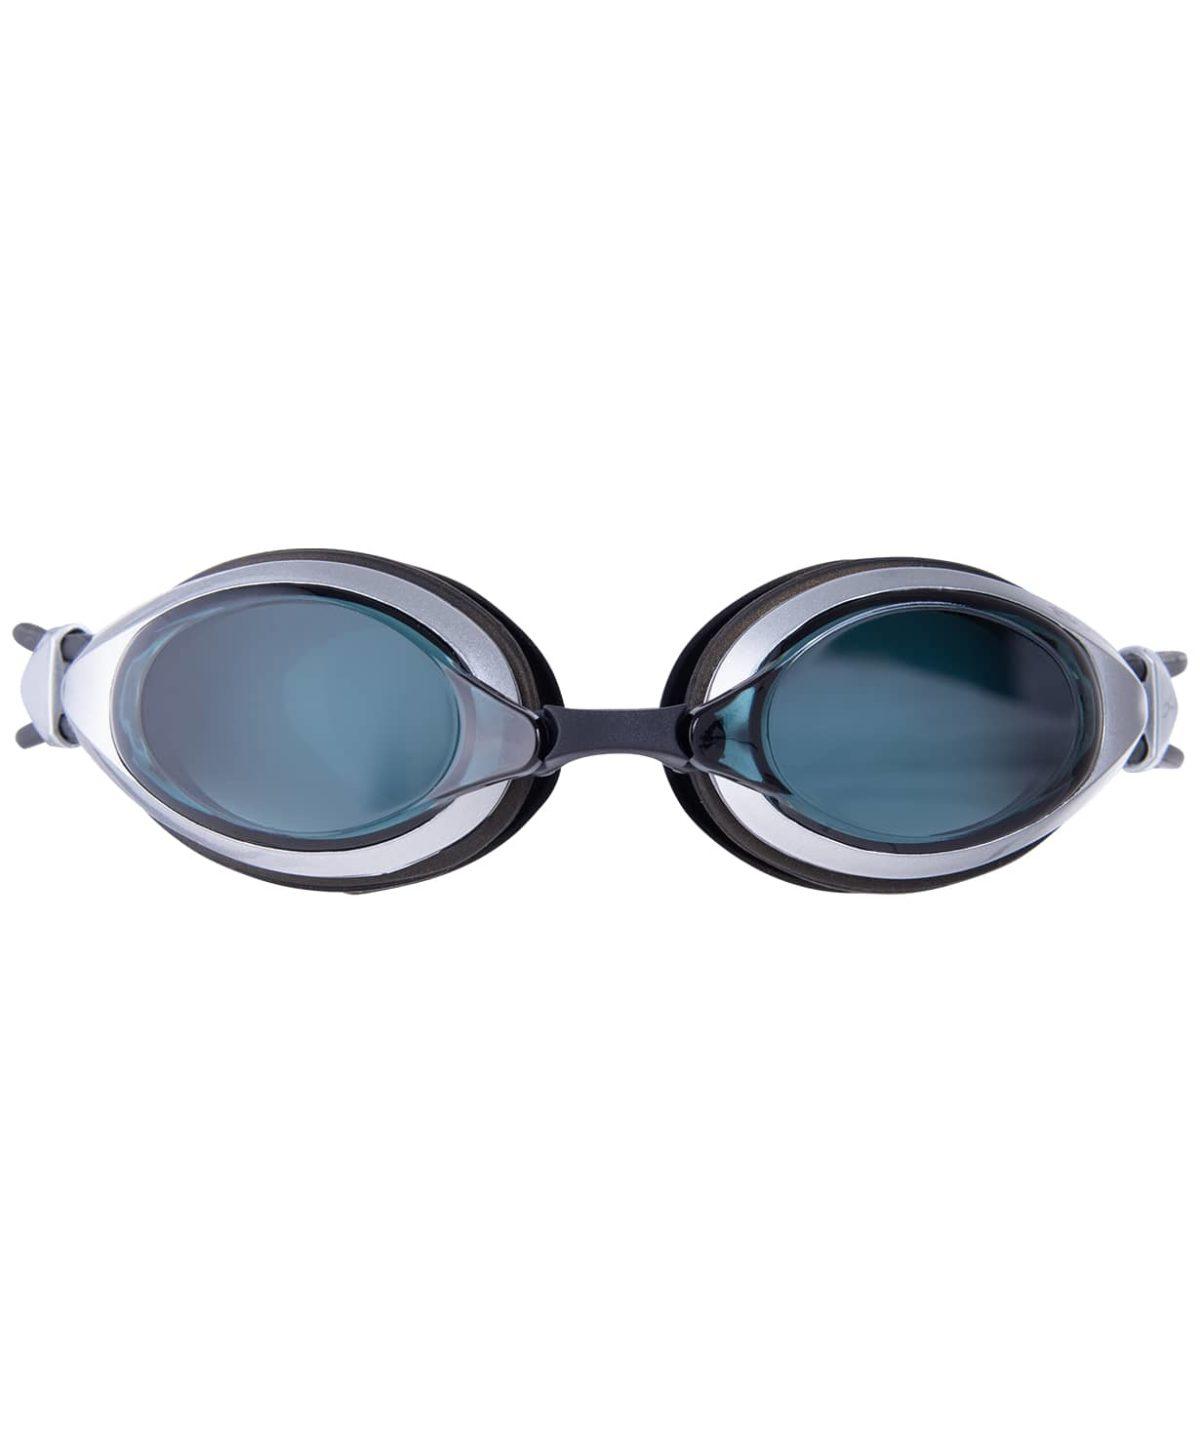 25DEGREES Pulso White/Black Очки для плавания  17352 - 2